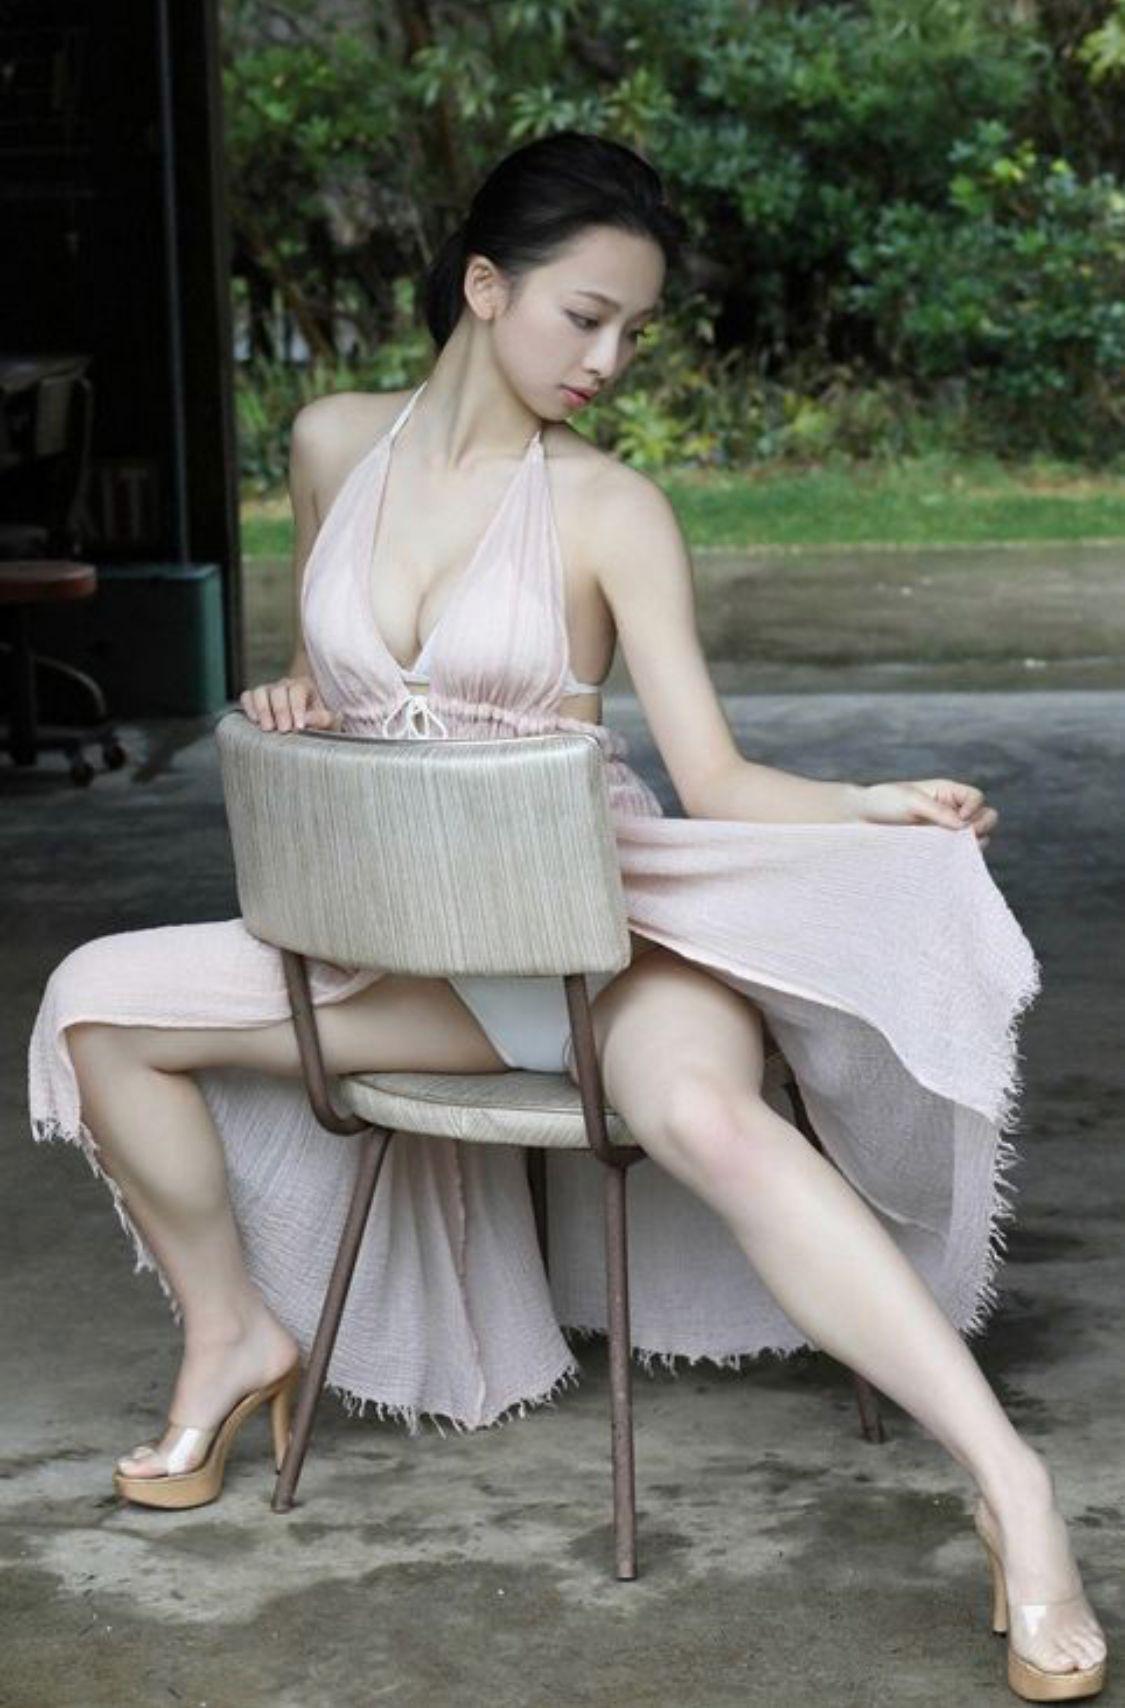 Young teen british girl naked